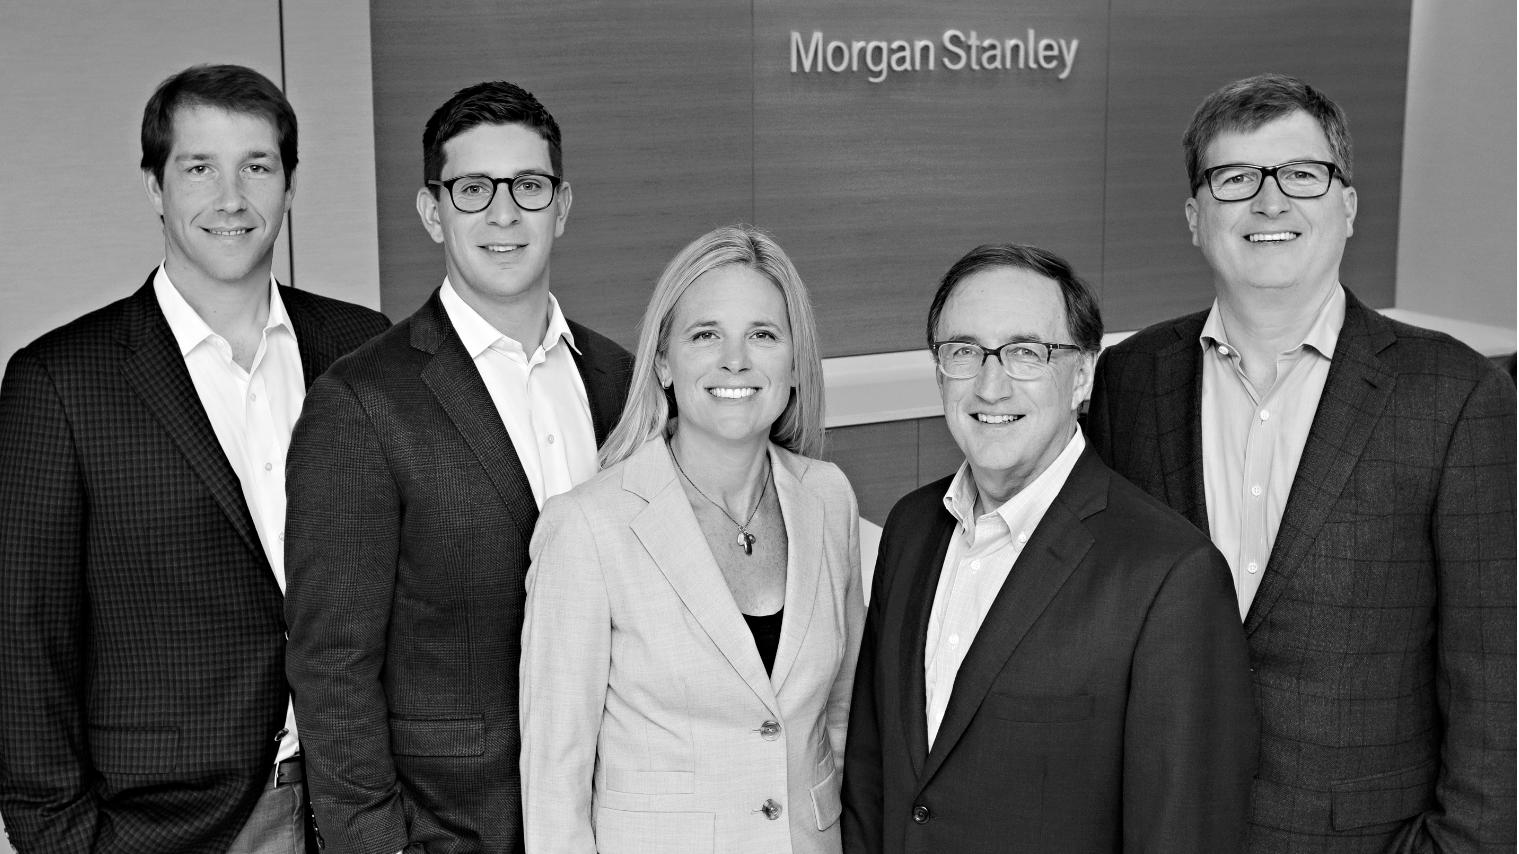 The Appleton Schlueter Group | San Francisco, CA | Morgan Stanley